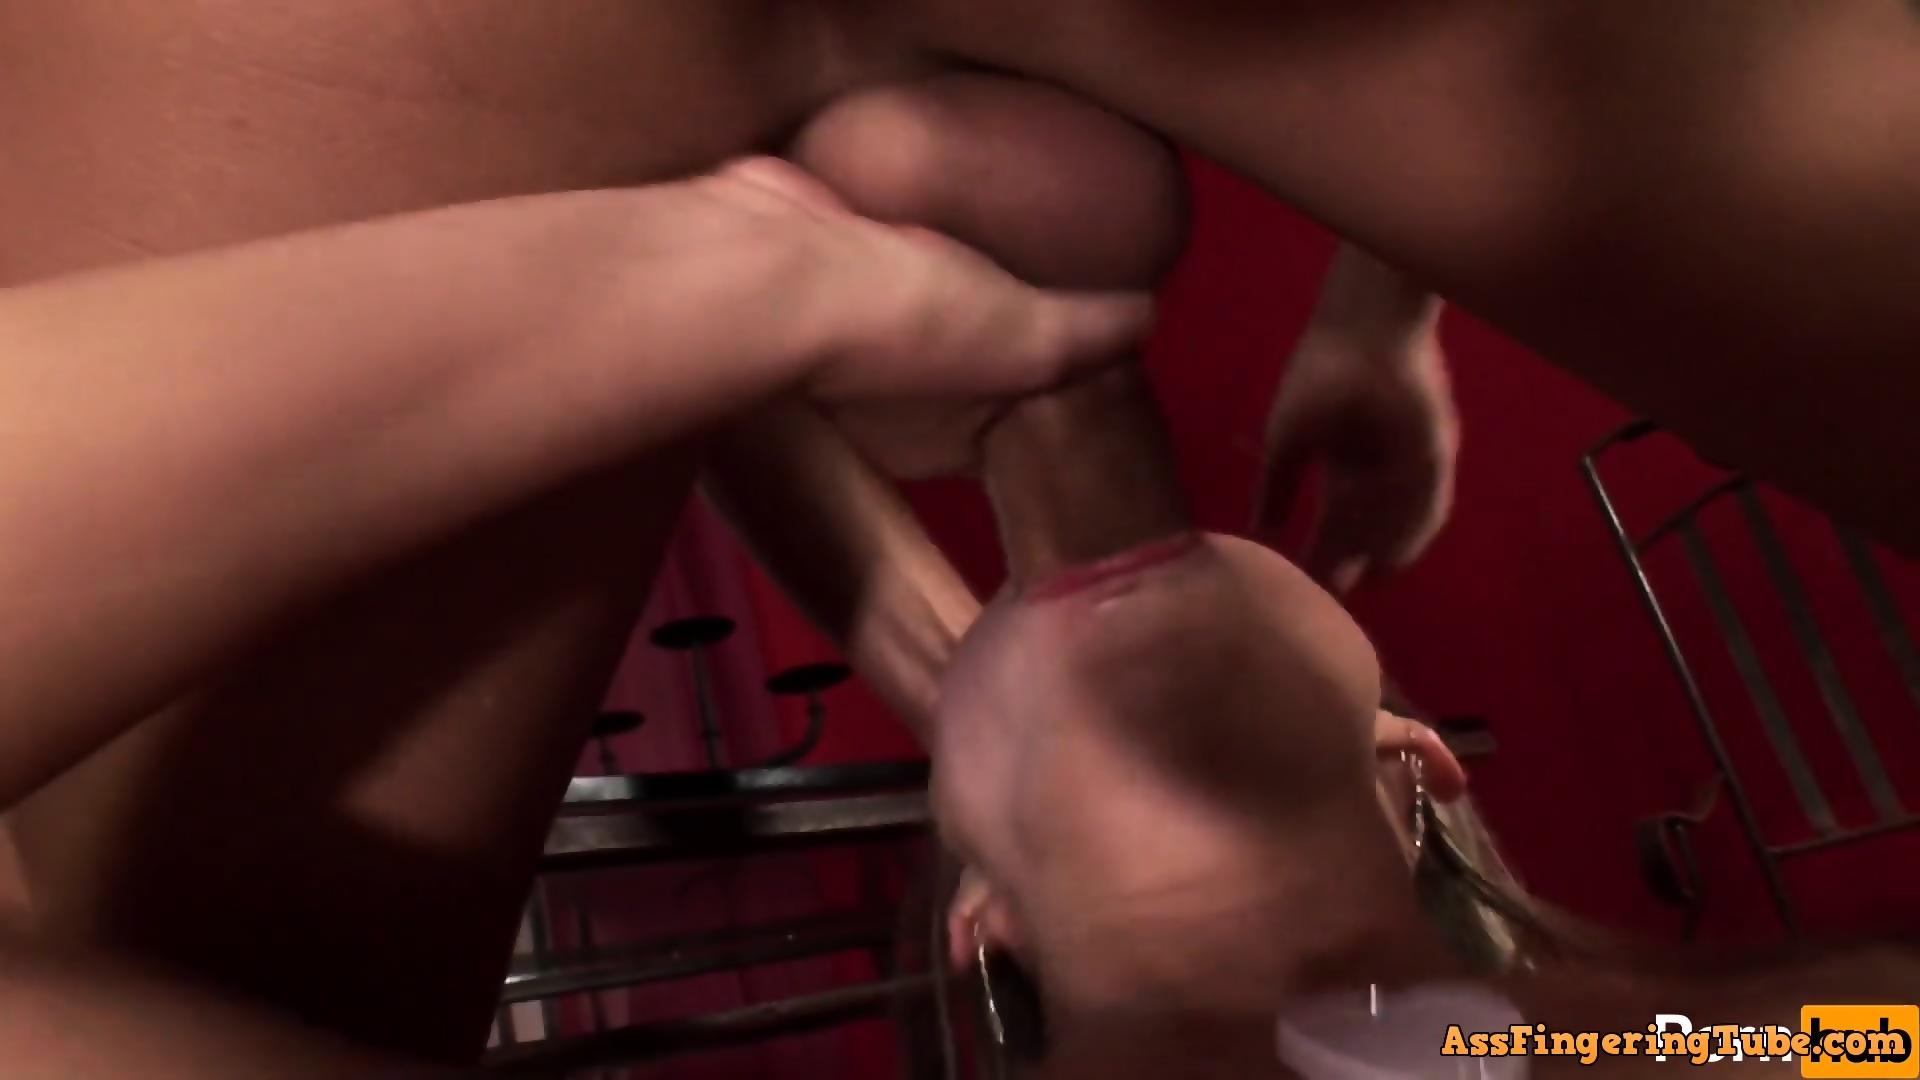 Petite Teen Big Dick Amateur